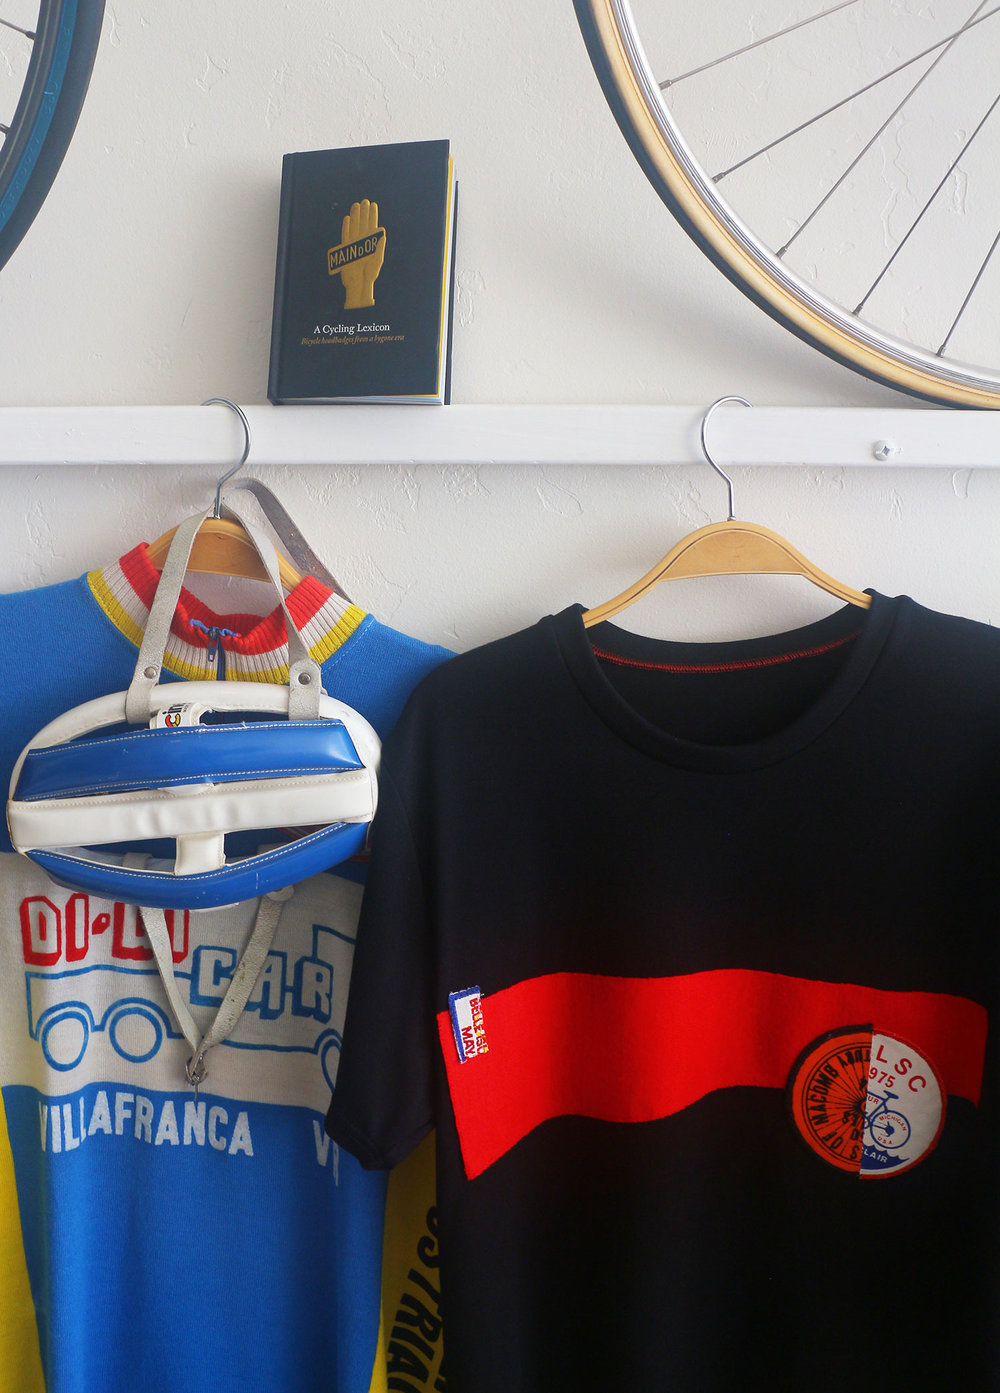 ron-miriello-grafico-san-diego-officina-eroica-vintage-cycling-jersey-maglia-bici-branding-05.jpg